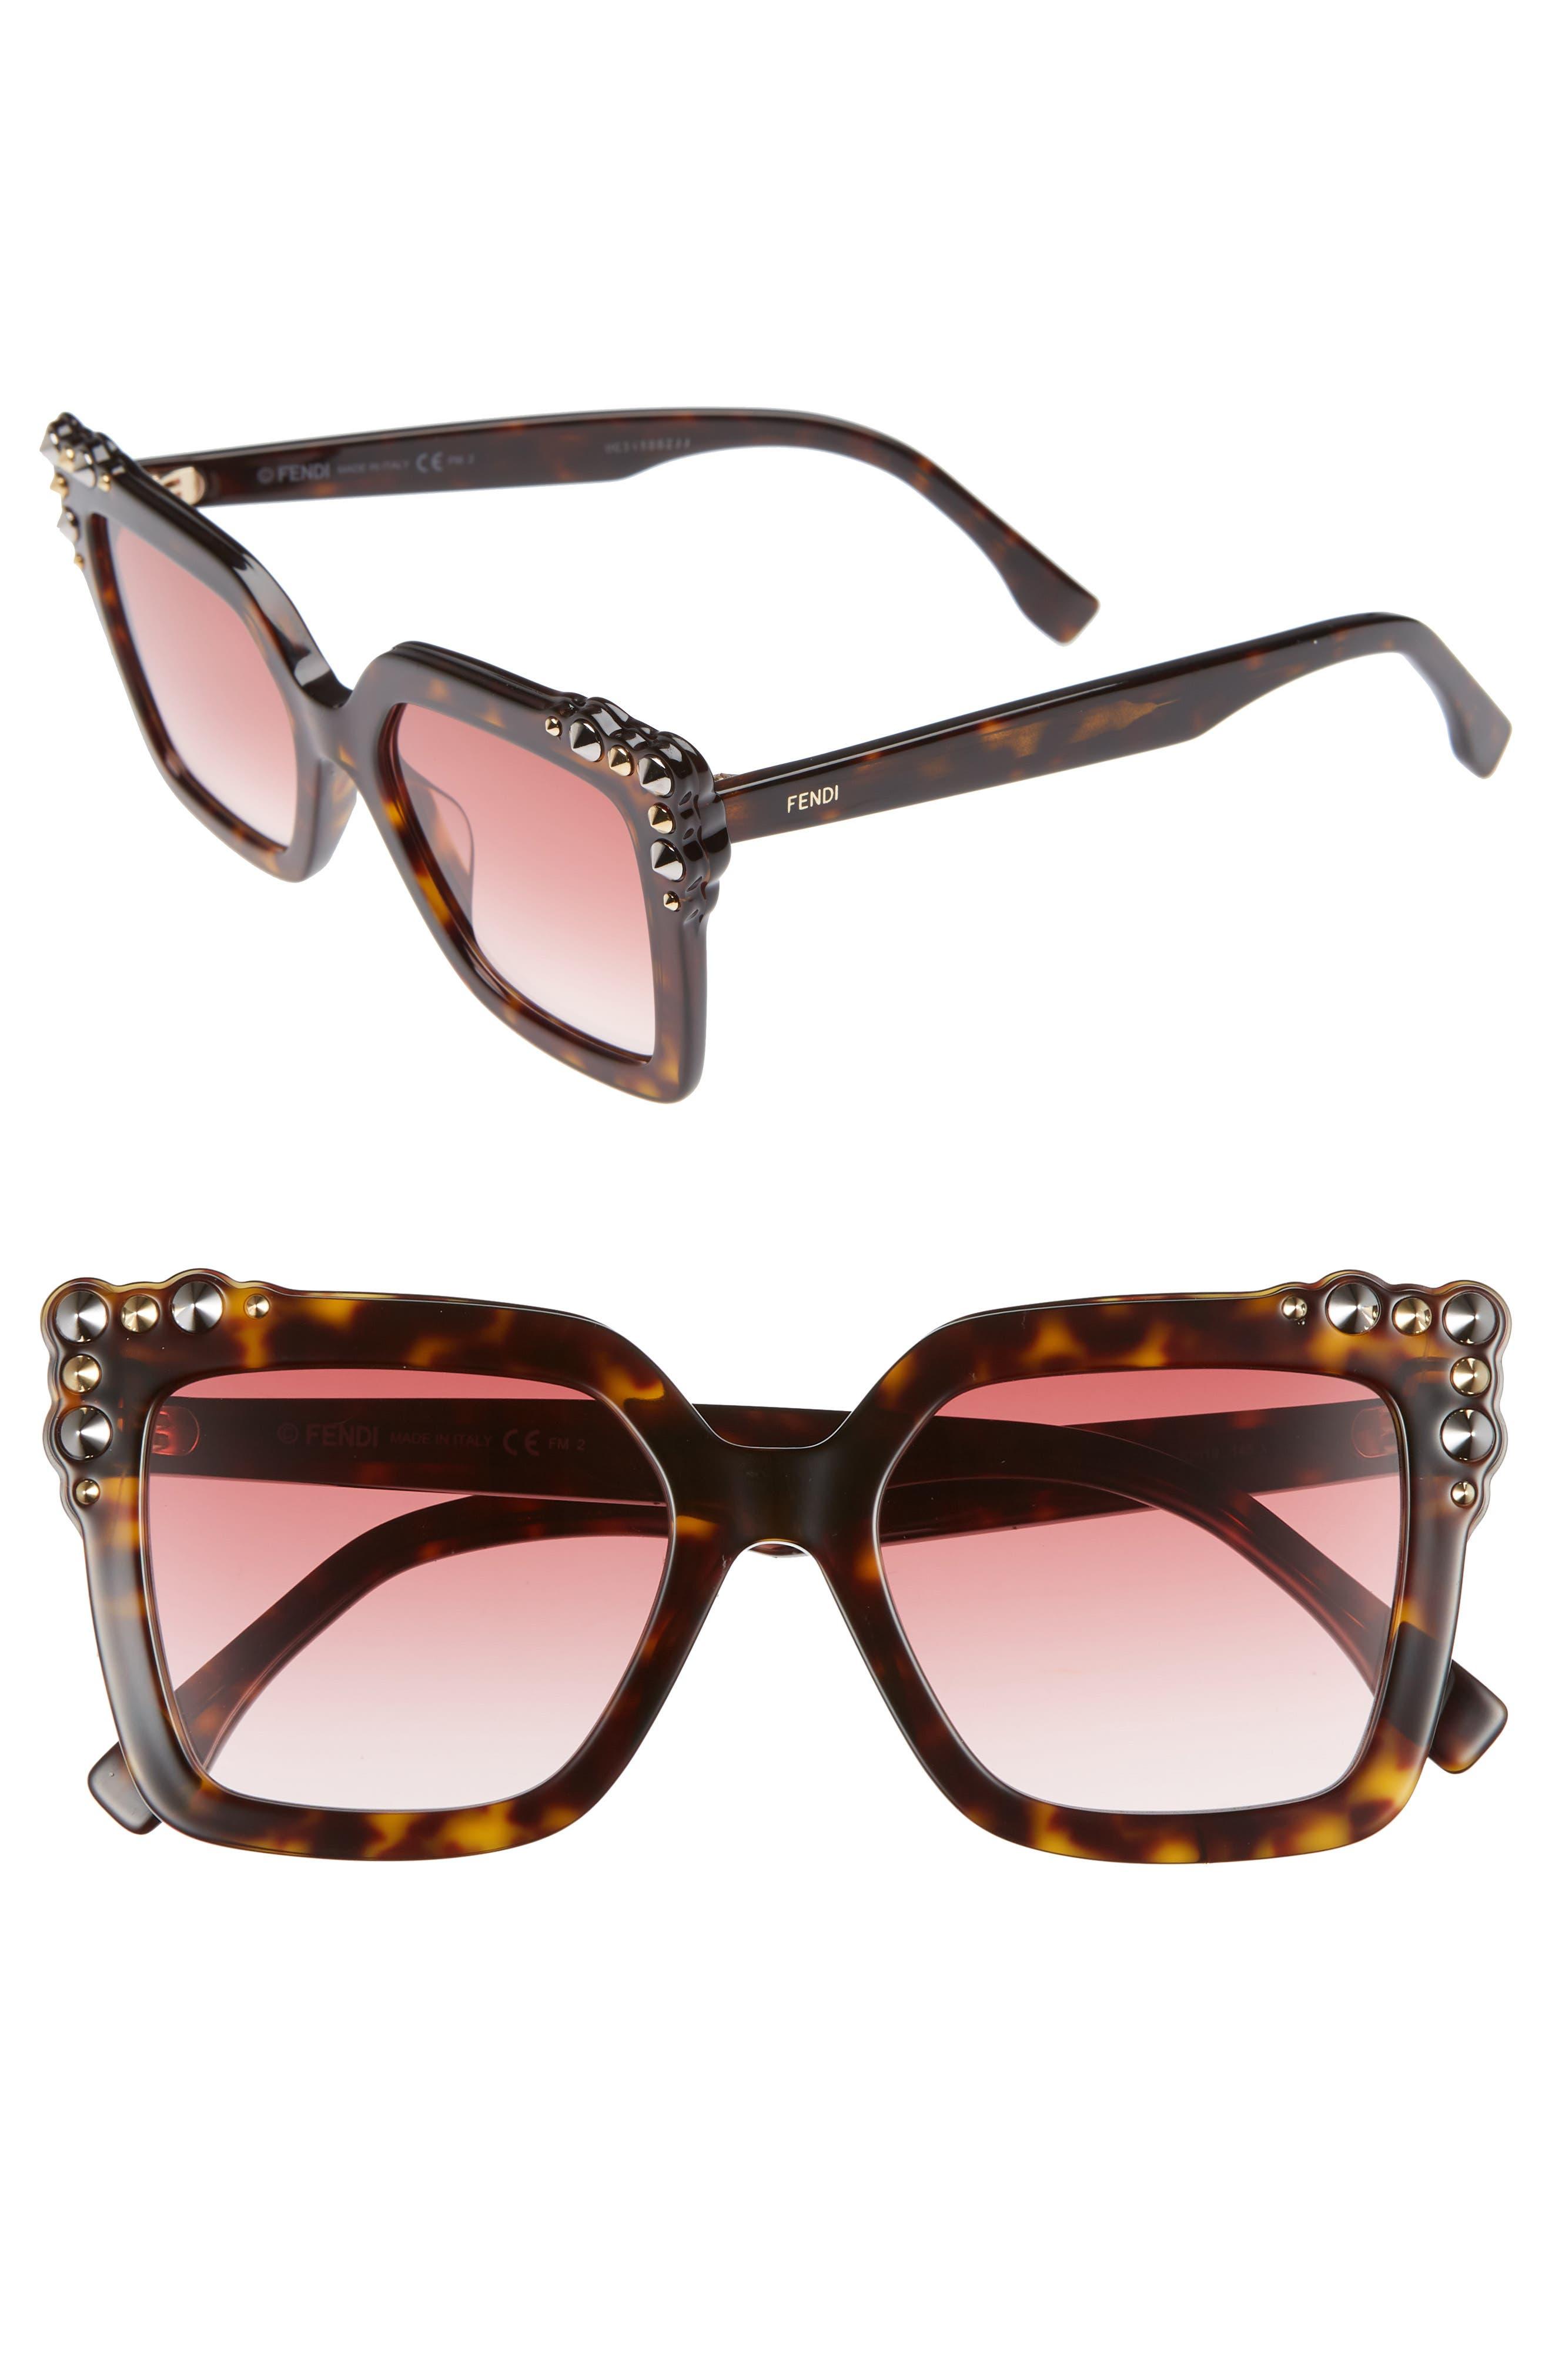 52mm Gradient Cat Eye Sunglasses,                             Main thumbnail 1, color,                             DARK HAVANA